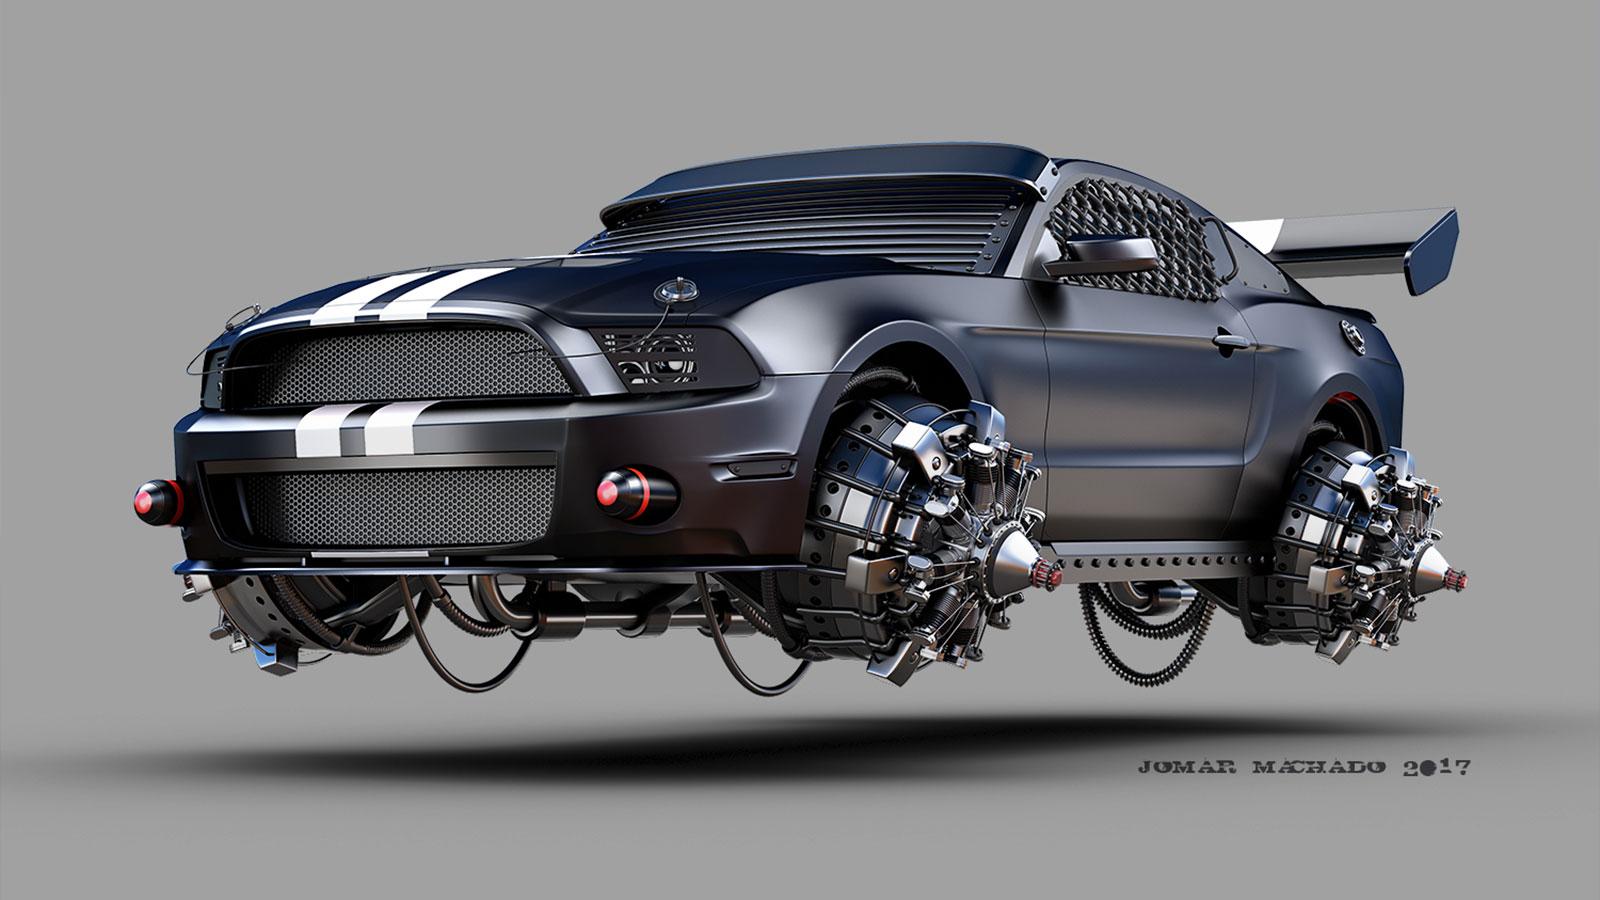 The Futuristic Vehicles Of Jomar Machado